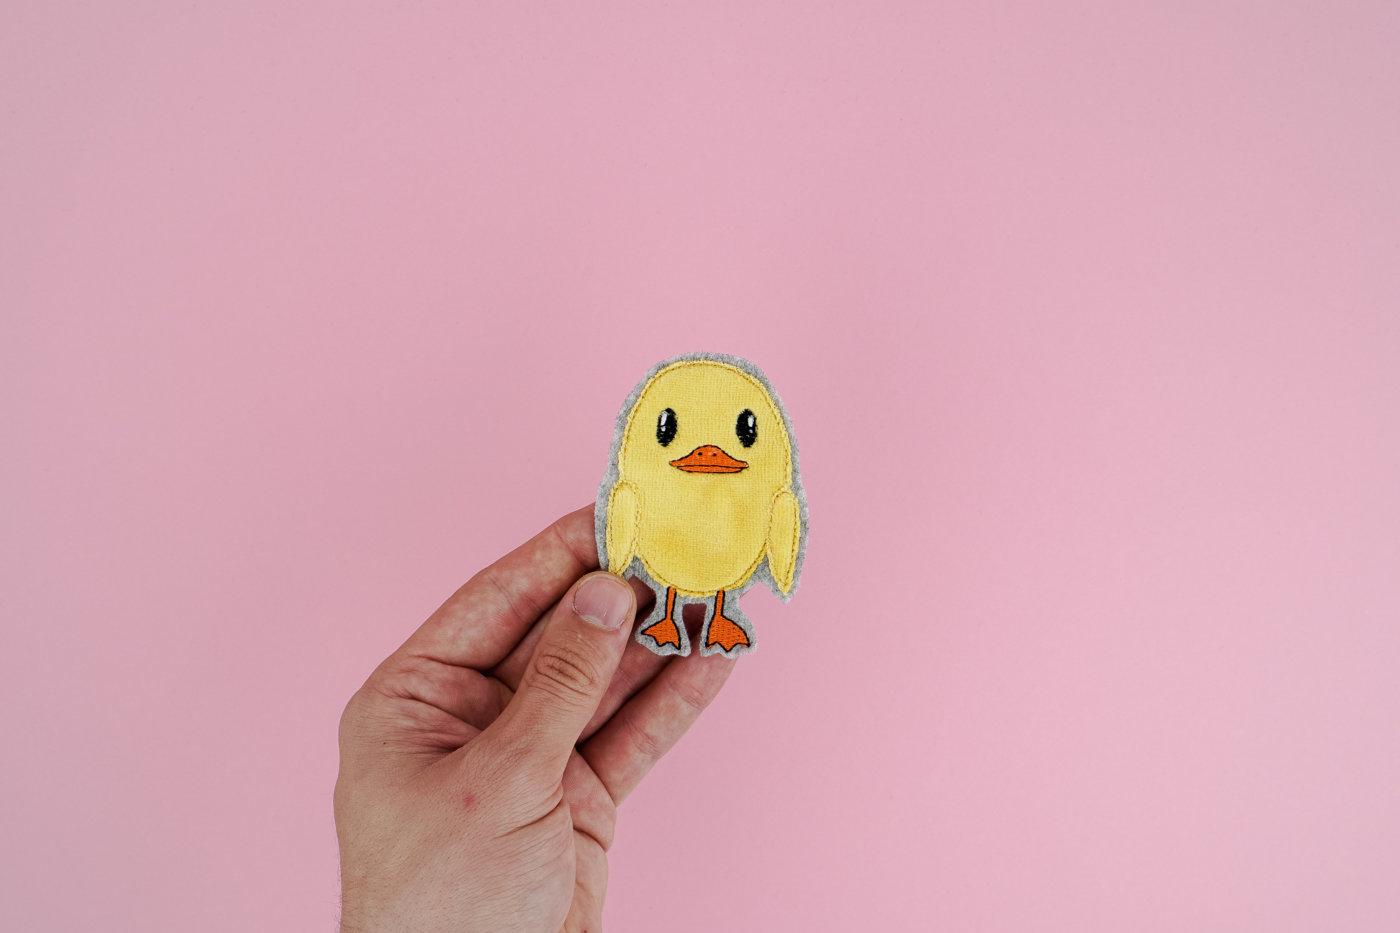 Machine embroidery design chick »Quack« #FLUFFIE & FANS [object object] »Quack« 🐥 by #FLUFFIE & FANS stickdatei fluffie kueken 02 1400x933